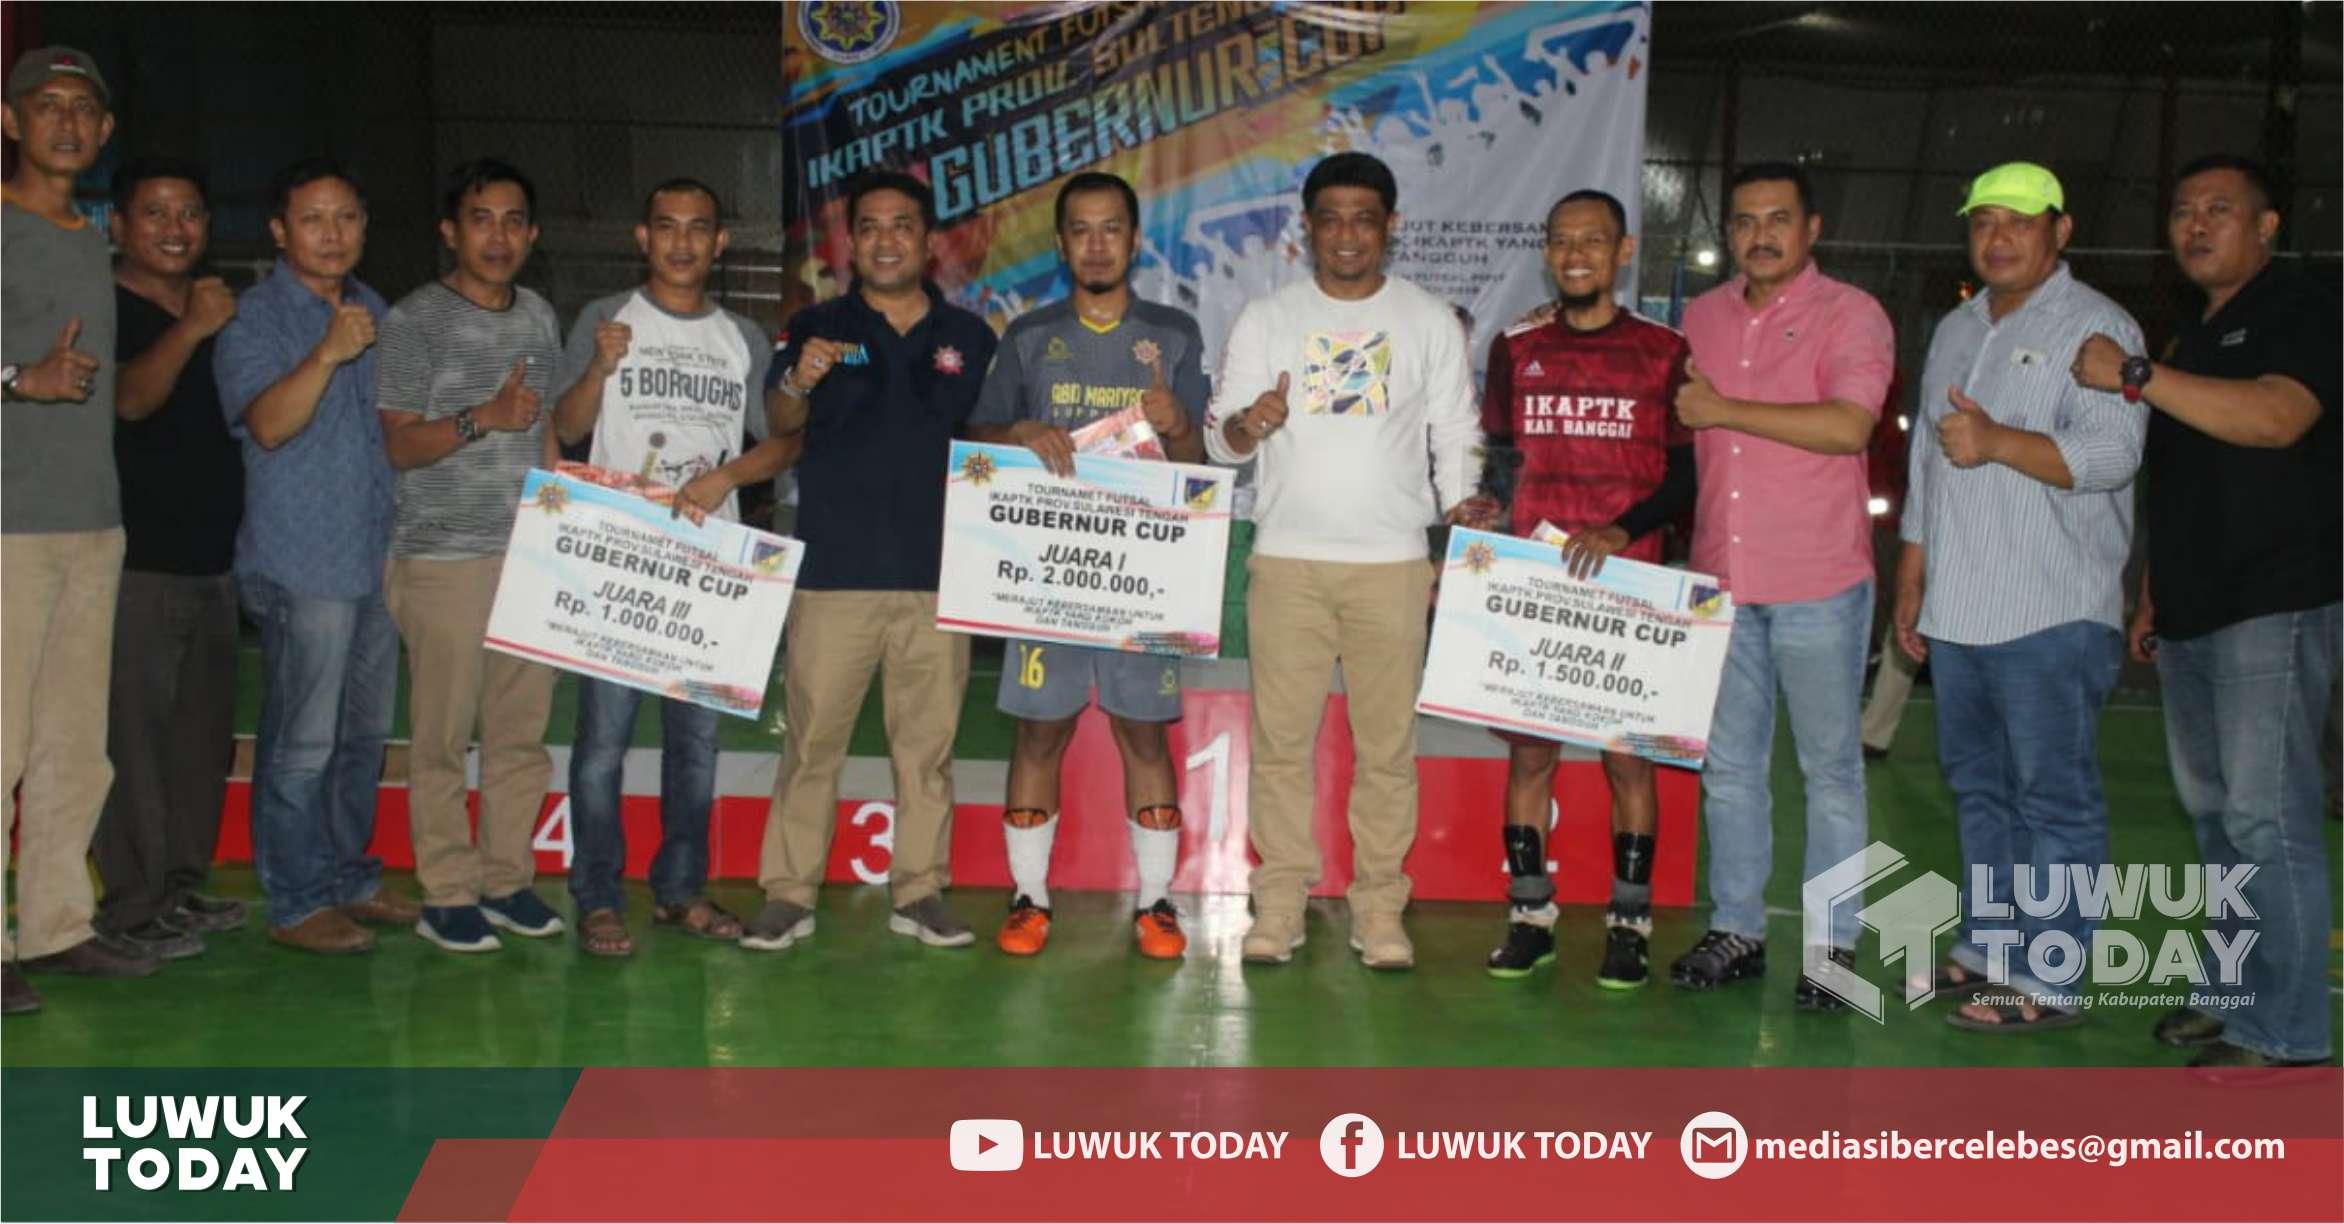 Foto Sekprov Sulteng H. Moh. Hidayat Lamakarate foto bersama para juara tournament futsal Gubernur Cup 2019, Sabtu (2/11/2019).